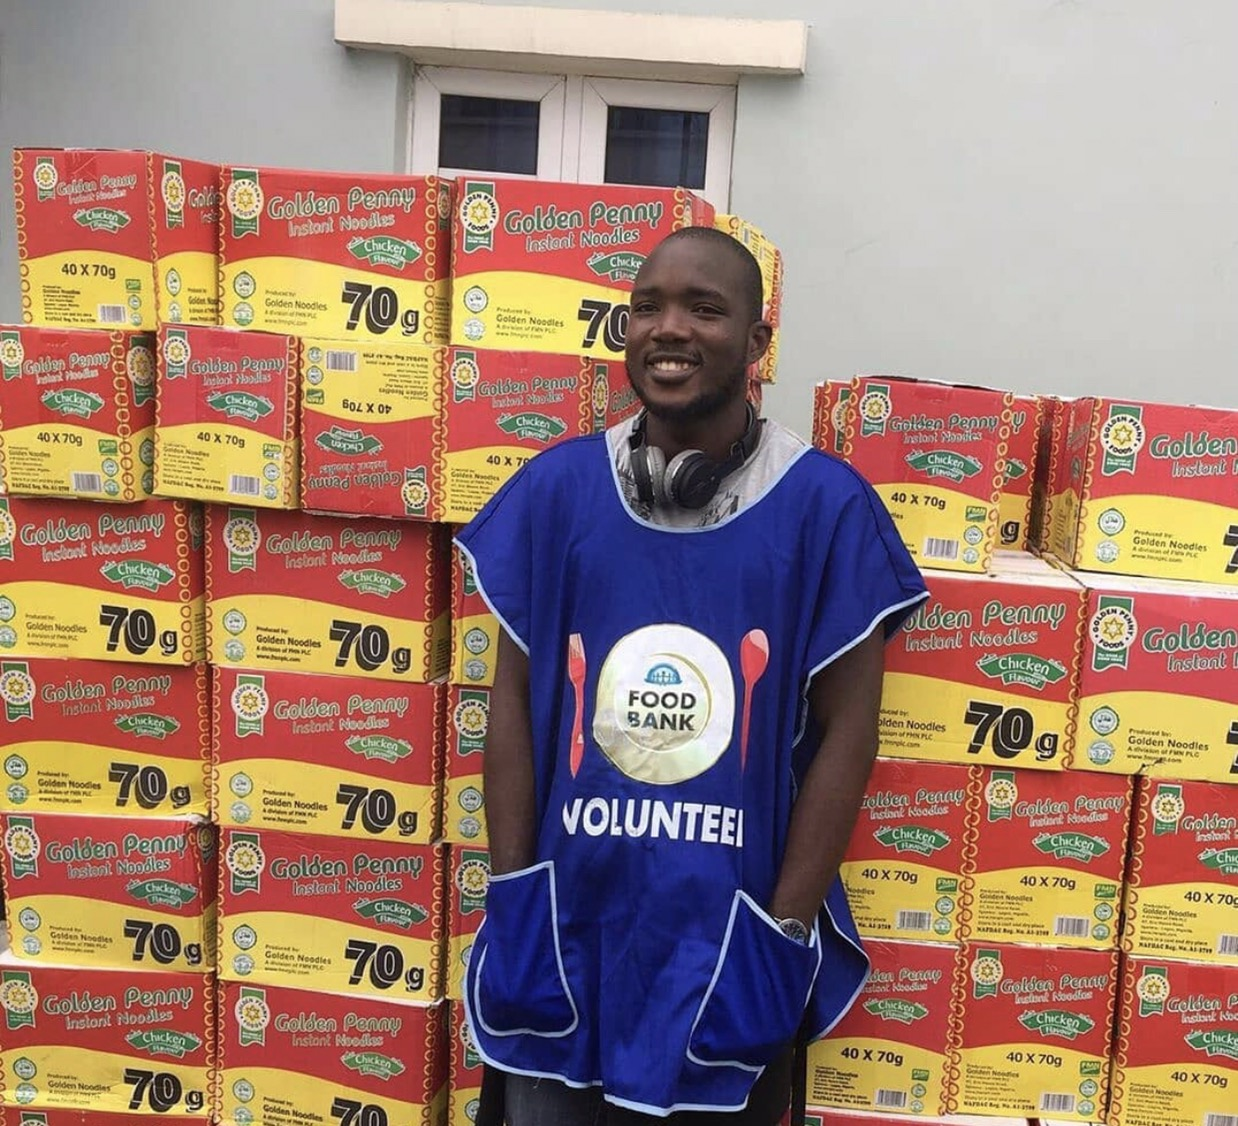 #volunteerspotlight Meet Somefun, a volunteer